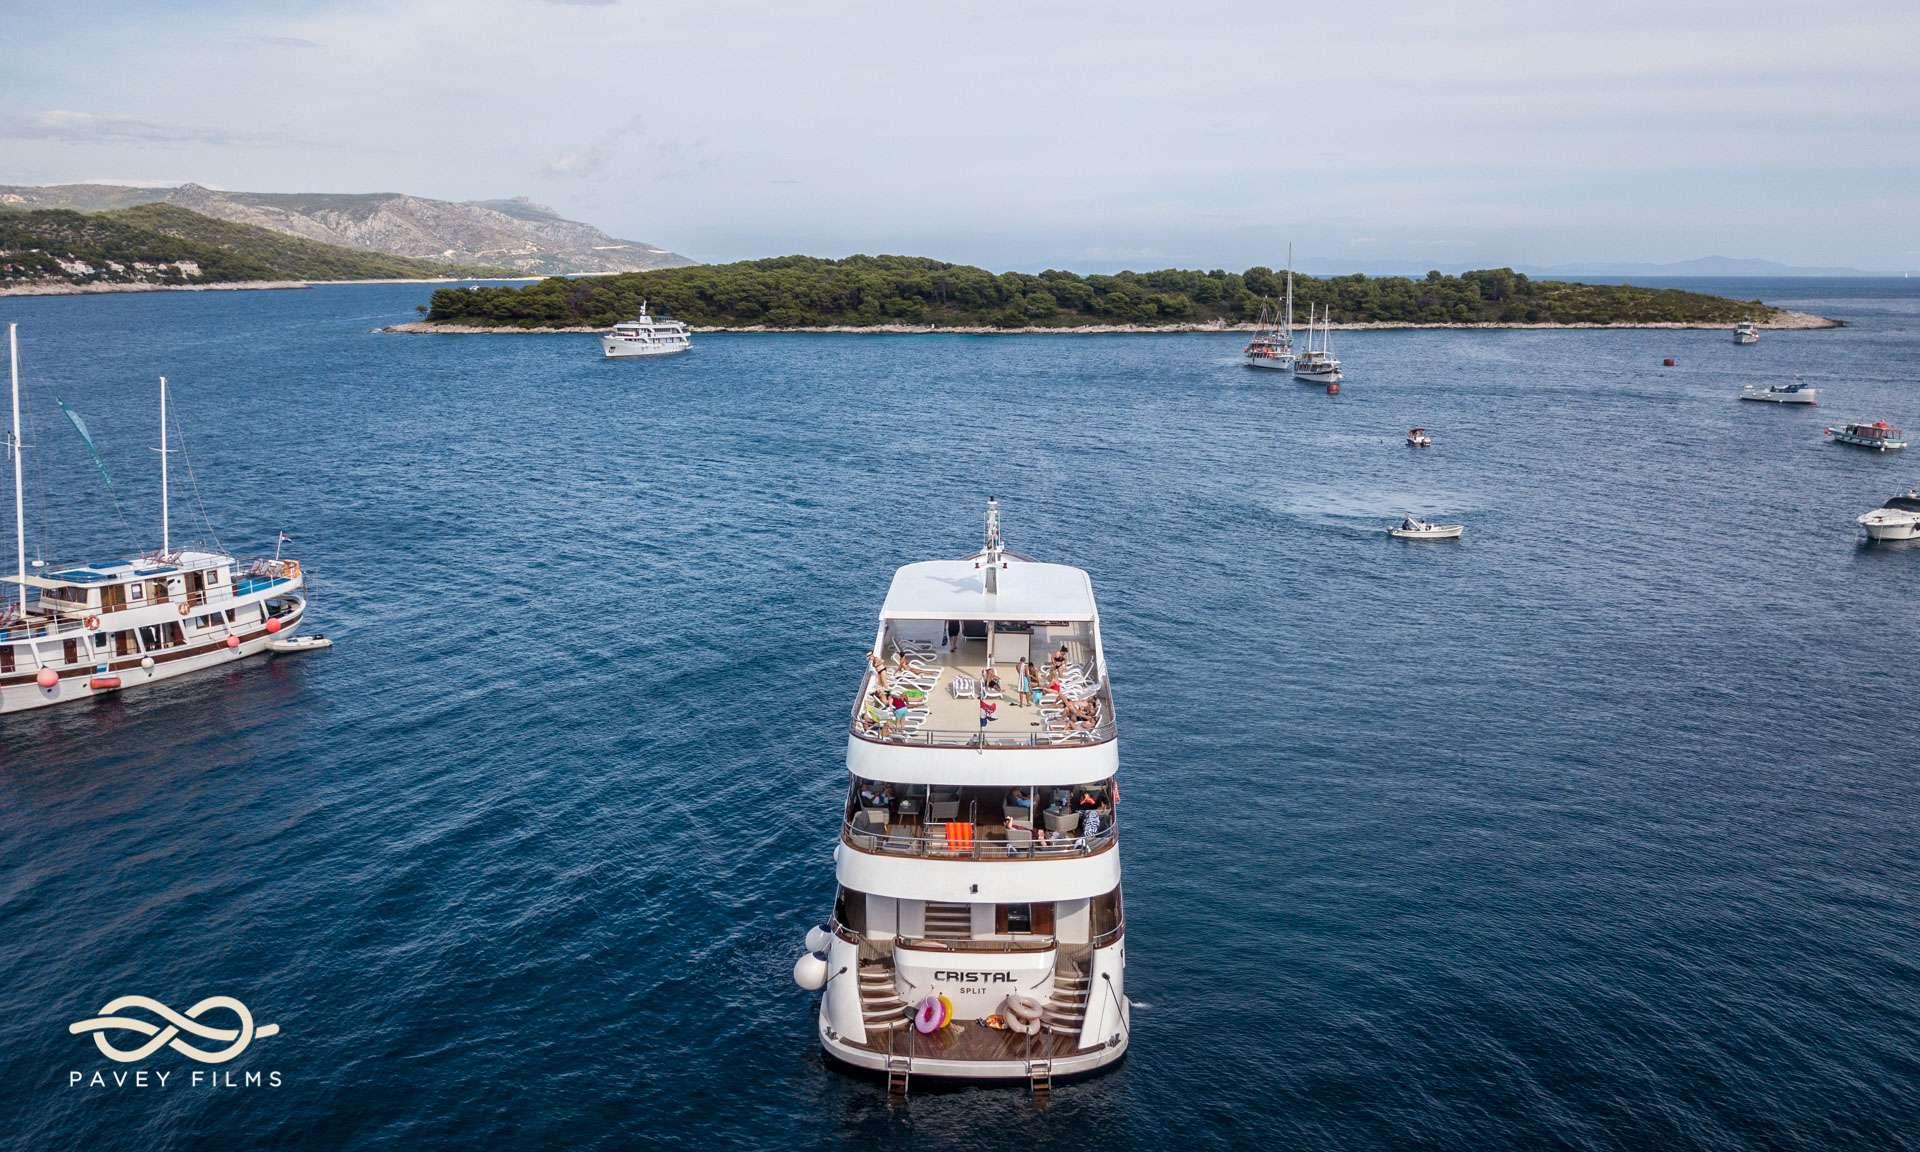 Image of Cristal yacht #3